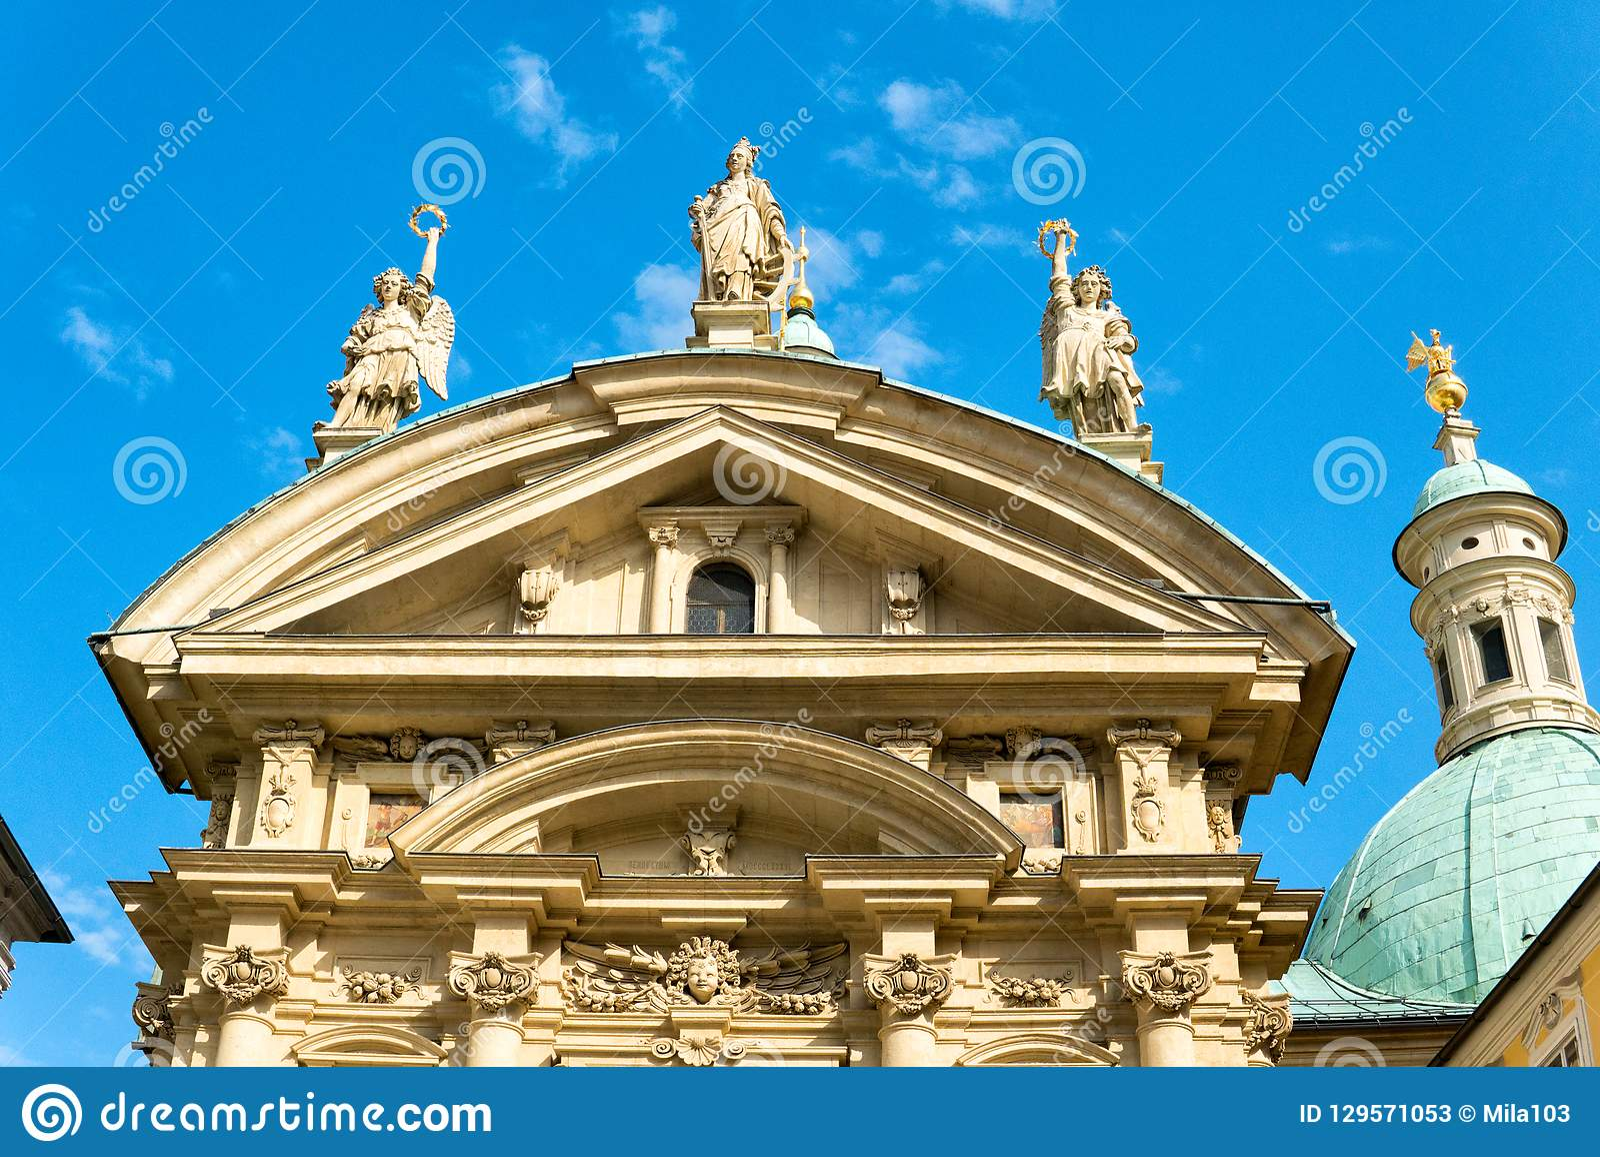 Facciata del mausoleo di Franz Ferdinand II a Graz, Stiria, Austria